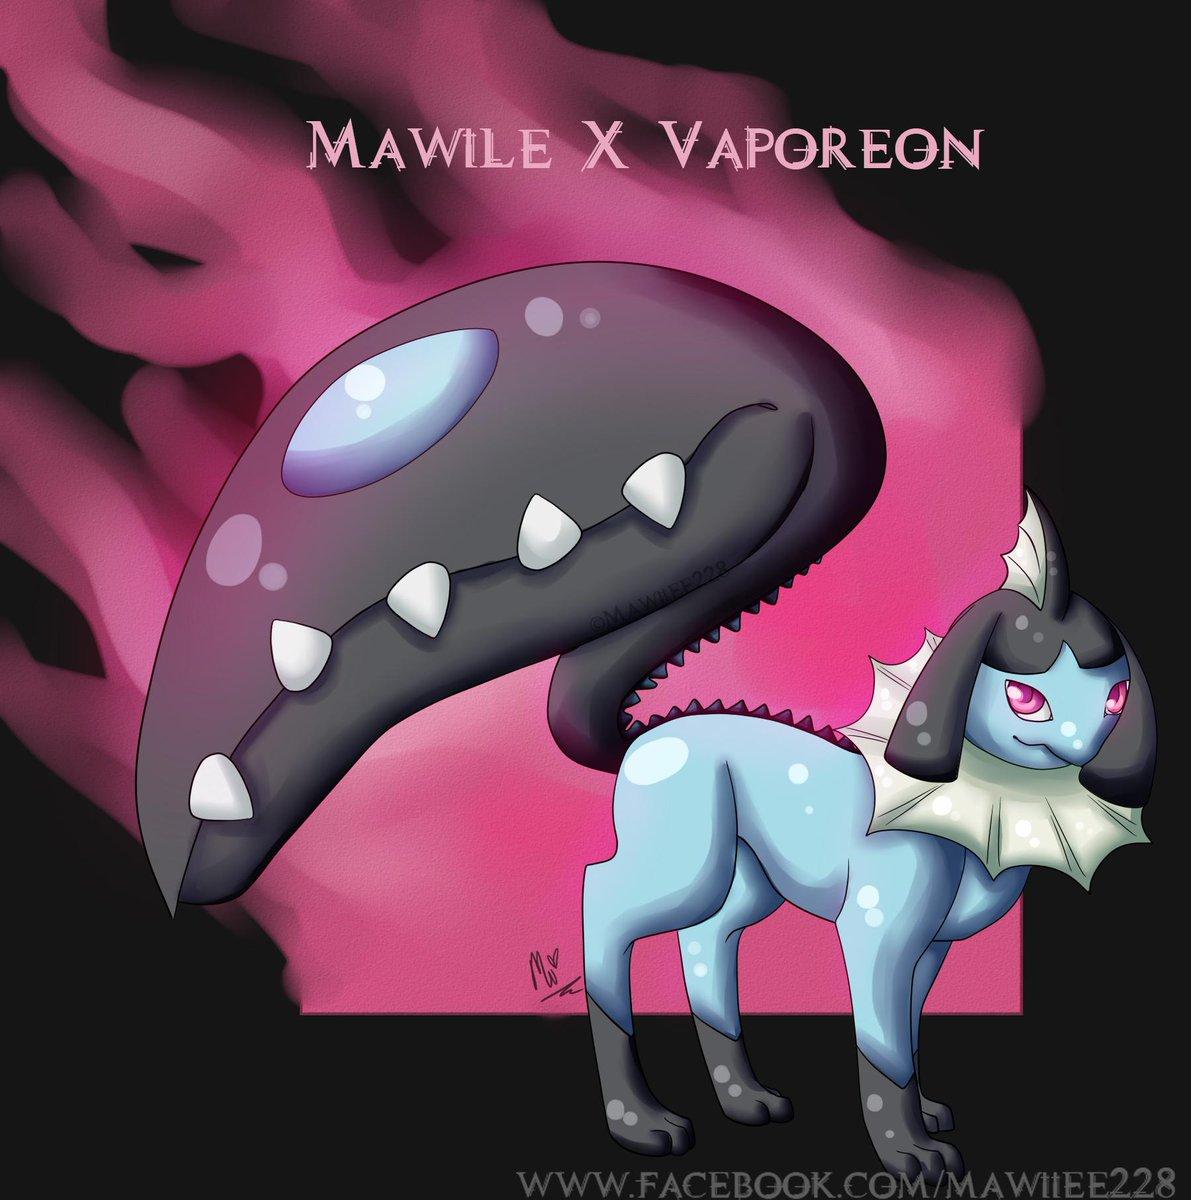 aluniart on twitter mawile x vaporeon pokemon fusion trickywii